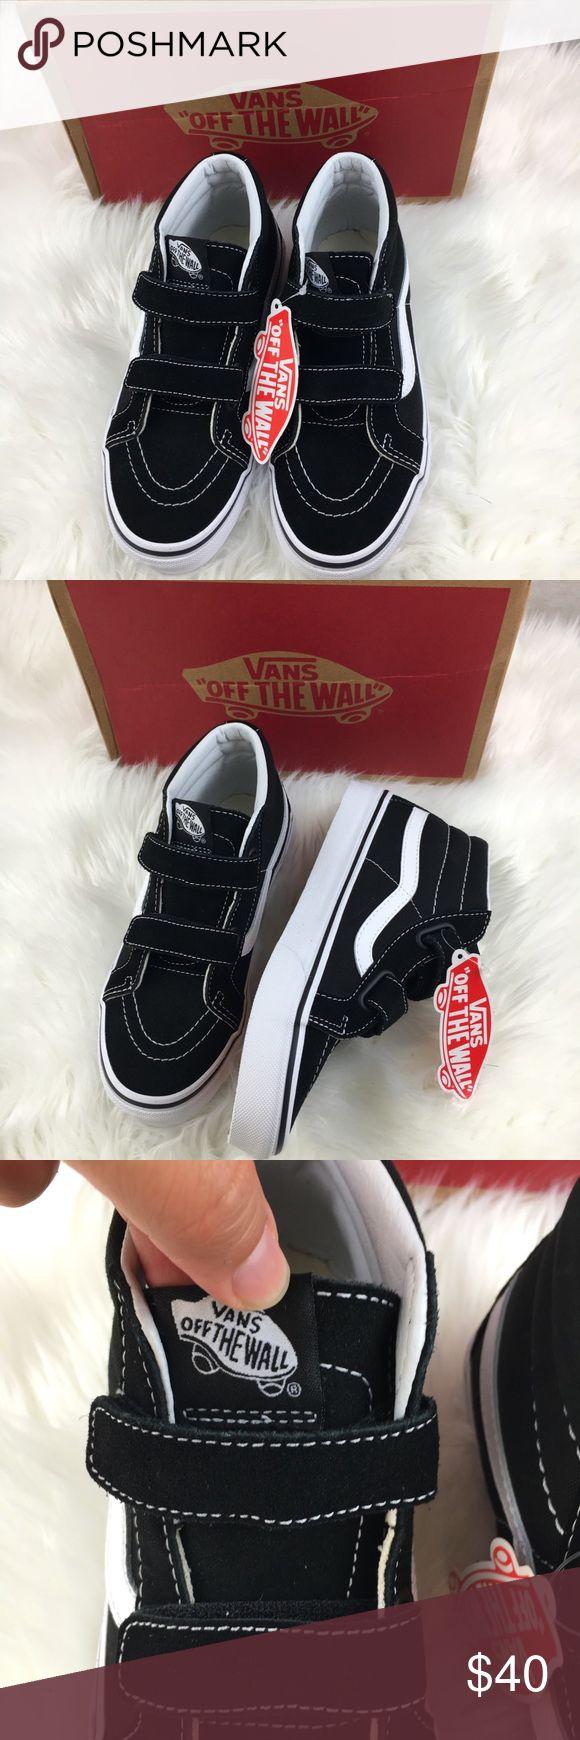 Vans Sk8 Mid Reissue V Size 3.5 Youth NIB Vans  SK8 Mid Reissue V Suede/Canvas  Size 3.5 Youth New in Box Vans Shoes Sneakers